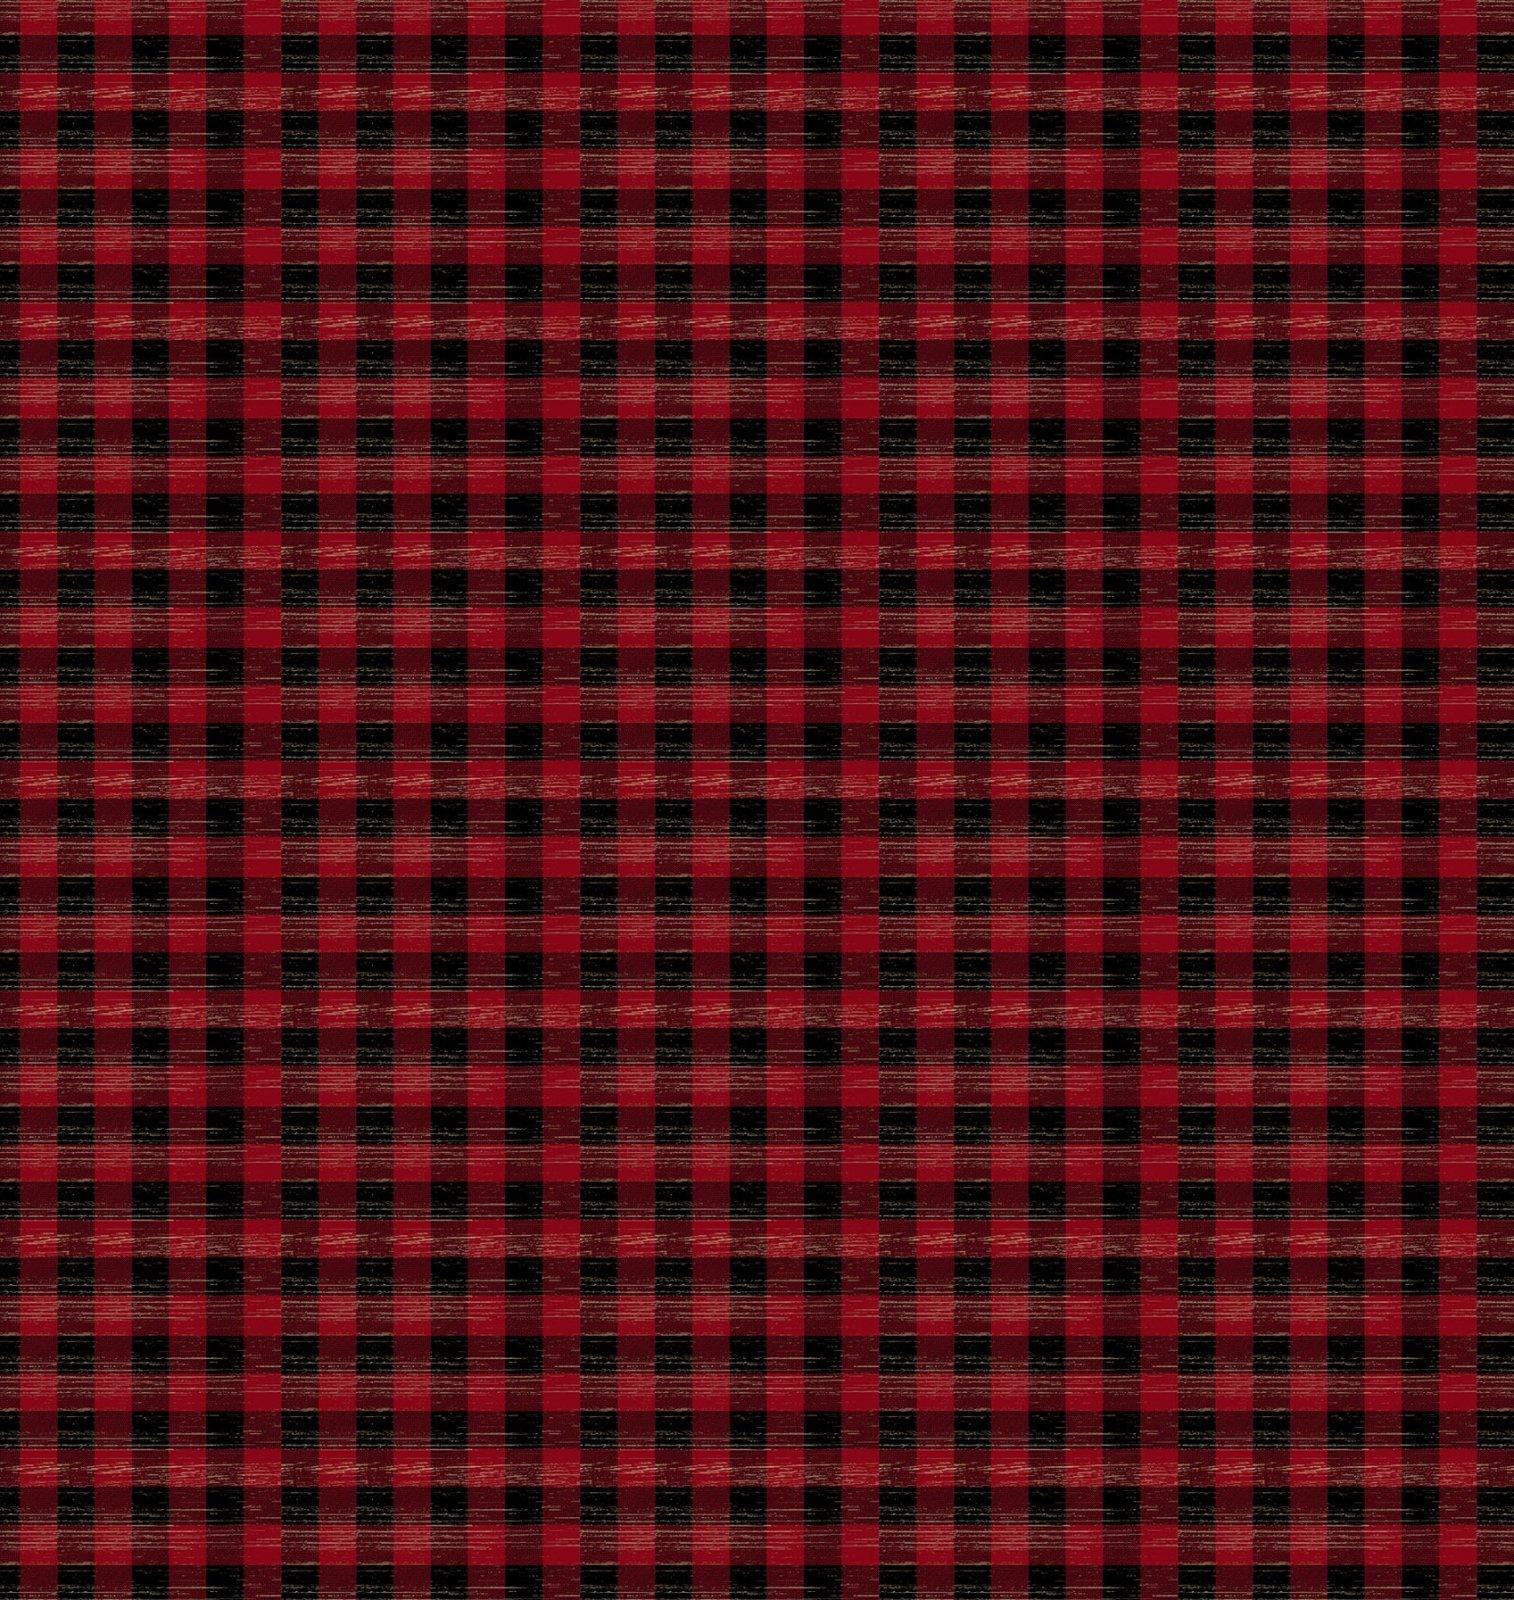 Jingle All The Way Red & Black - Plaid